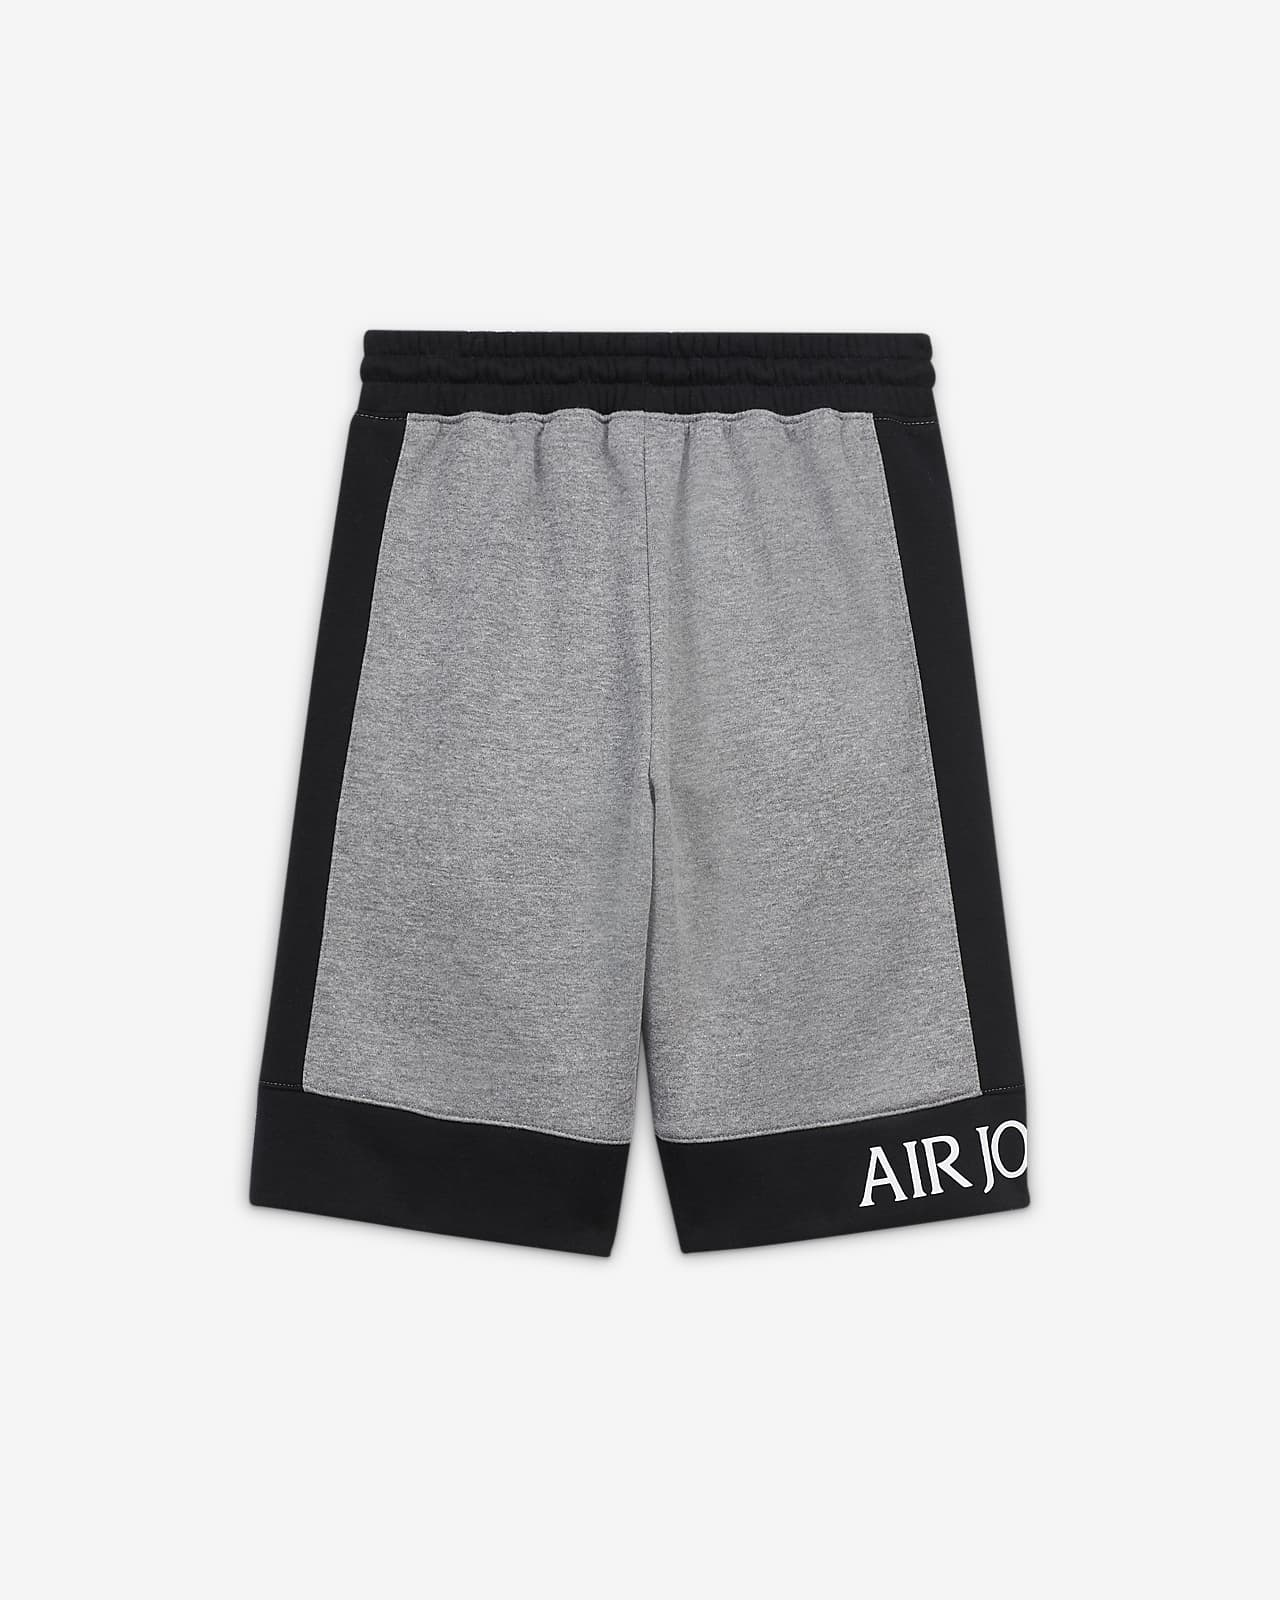 Jordan Older Kids' (Boys') Shorts. Nike GB